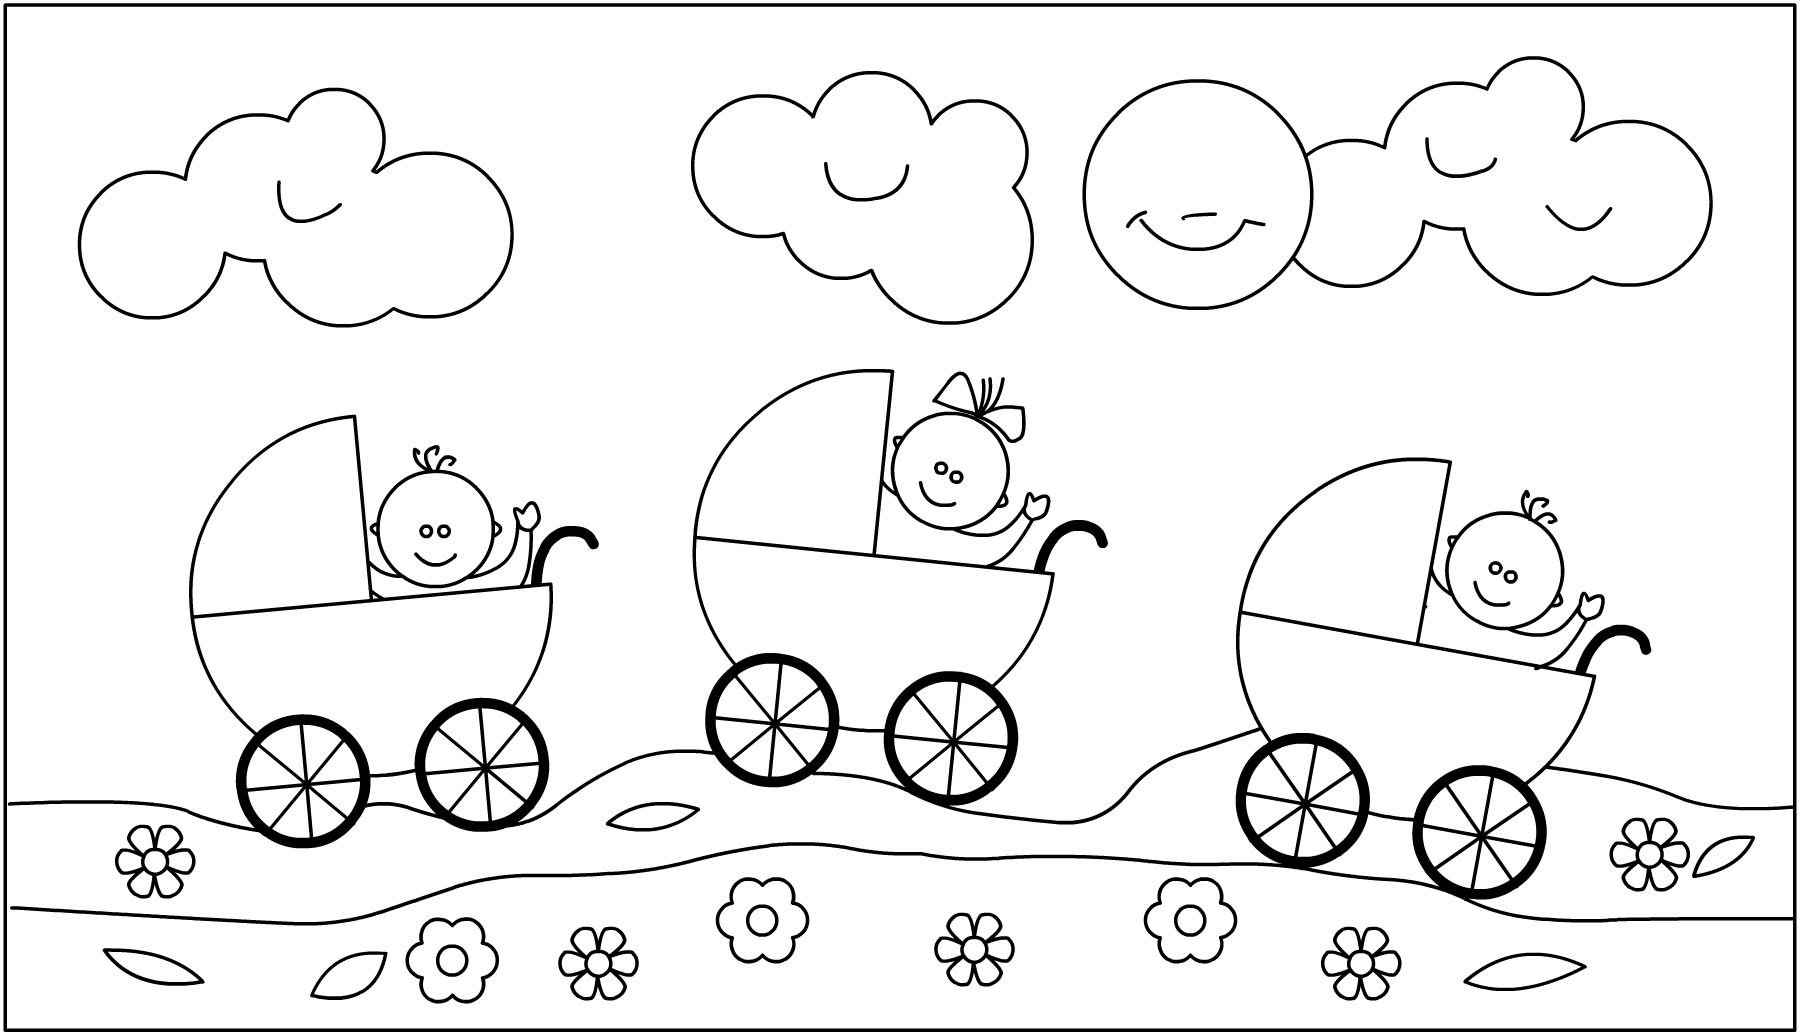 Kleurplaten Baby Born.Kleurplaat Thema Baby Imprimibles Knutselen Thema Baby Baby